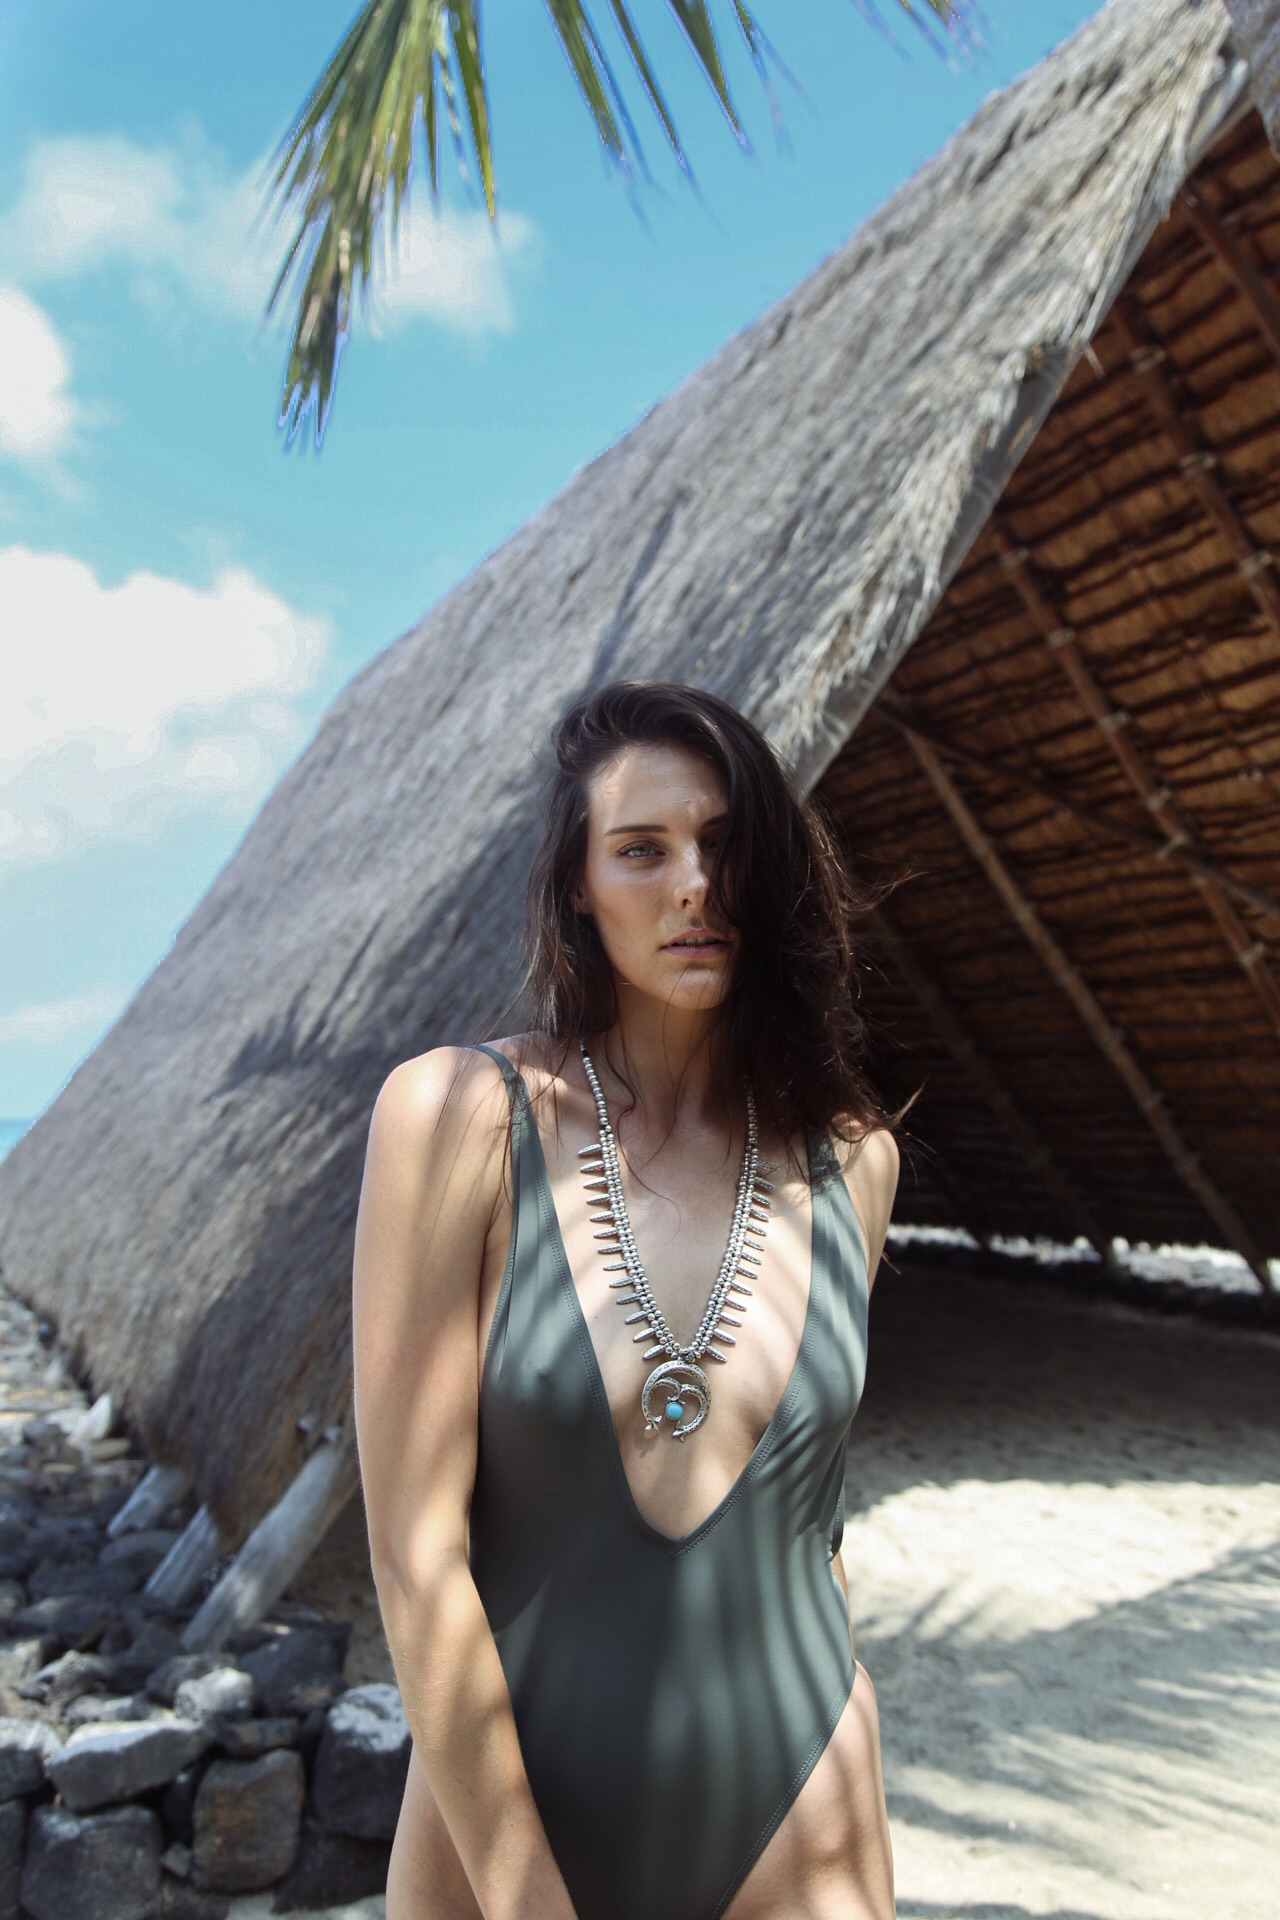 Swimsuit: Dippin' Daisies // Jewelry: Natalie B Jewelry